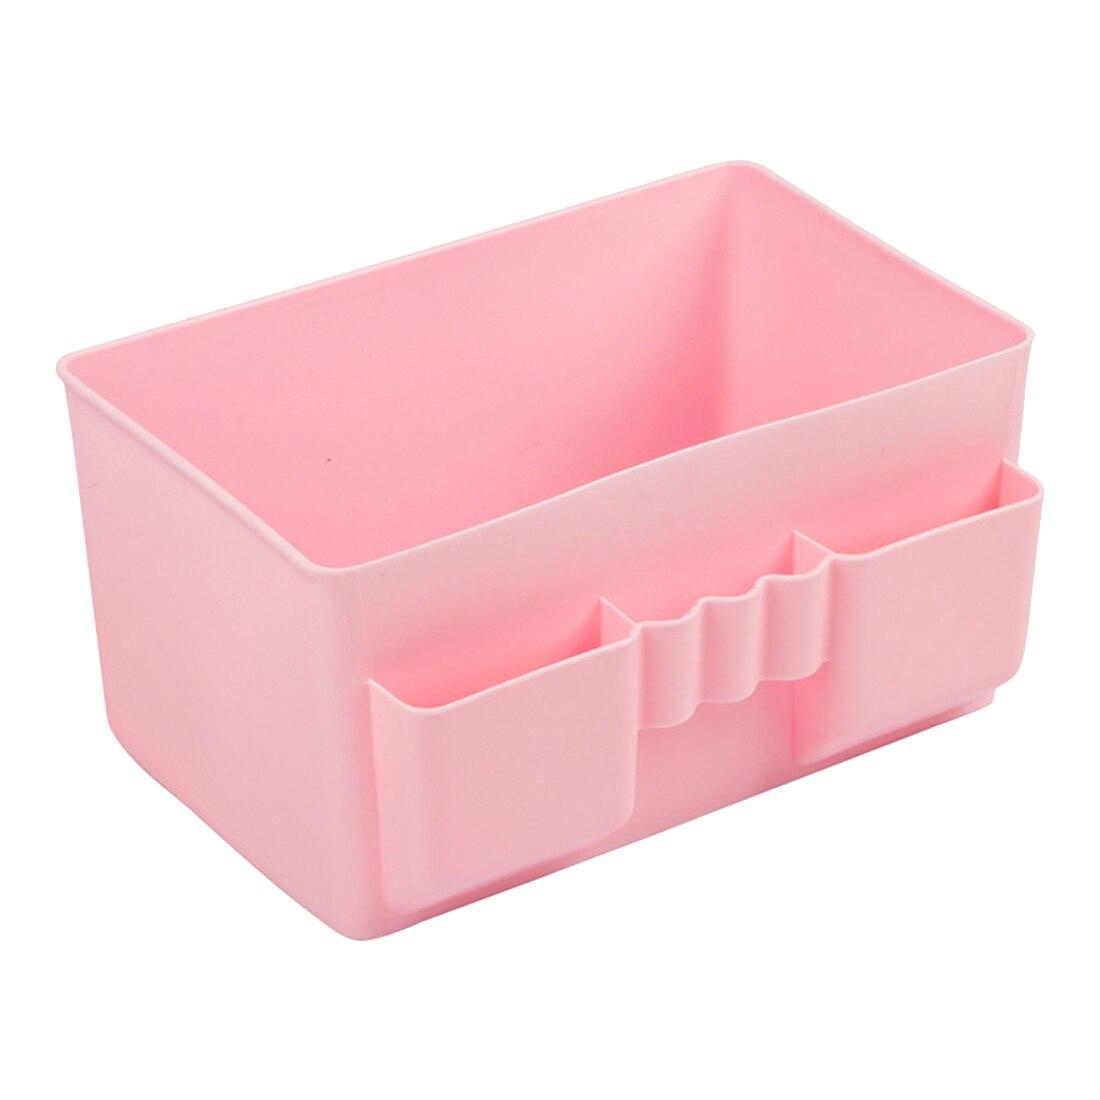 Hot Sale Cute Plastic Office Desktop Storage Boxes Makeup Organizer Storage Box #69829